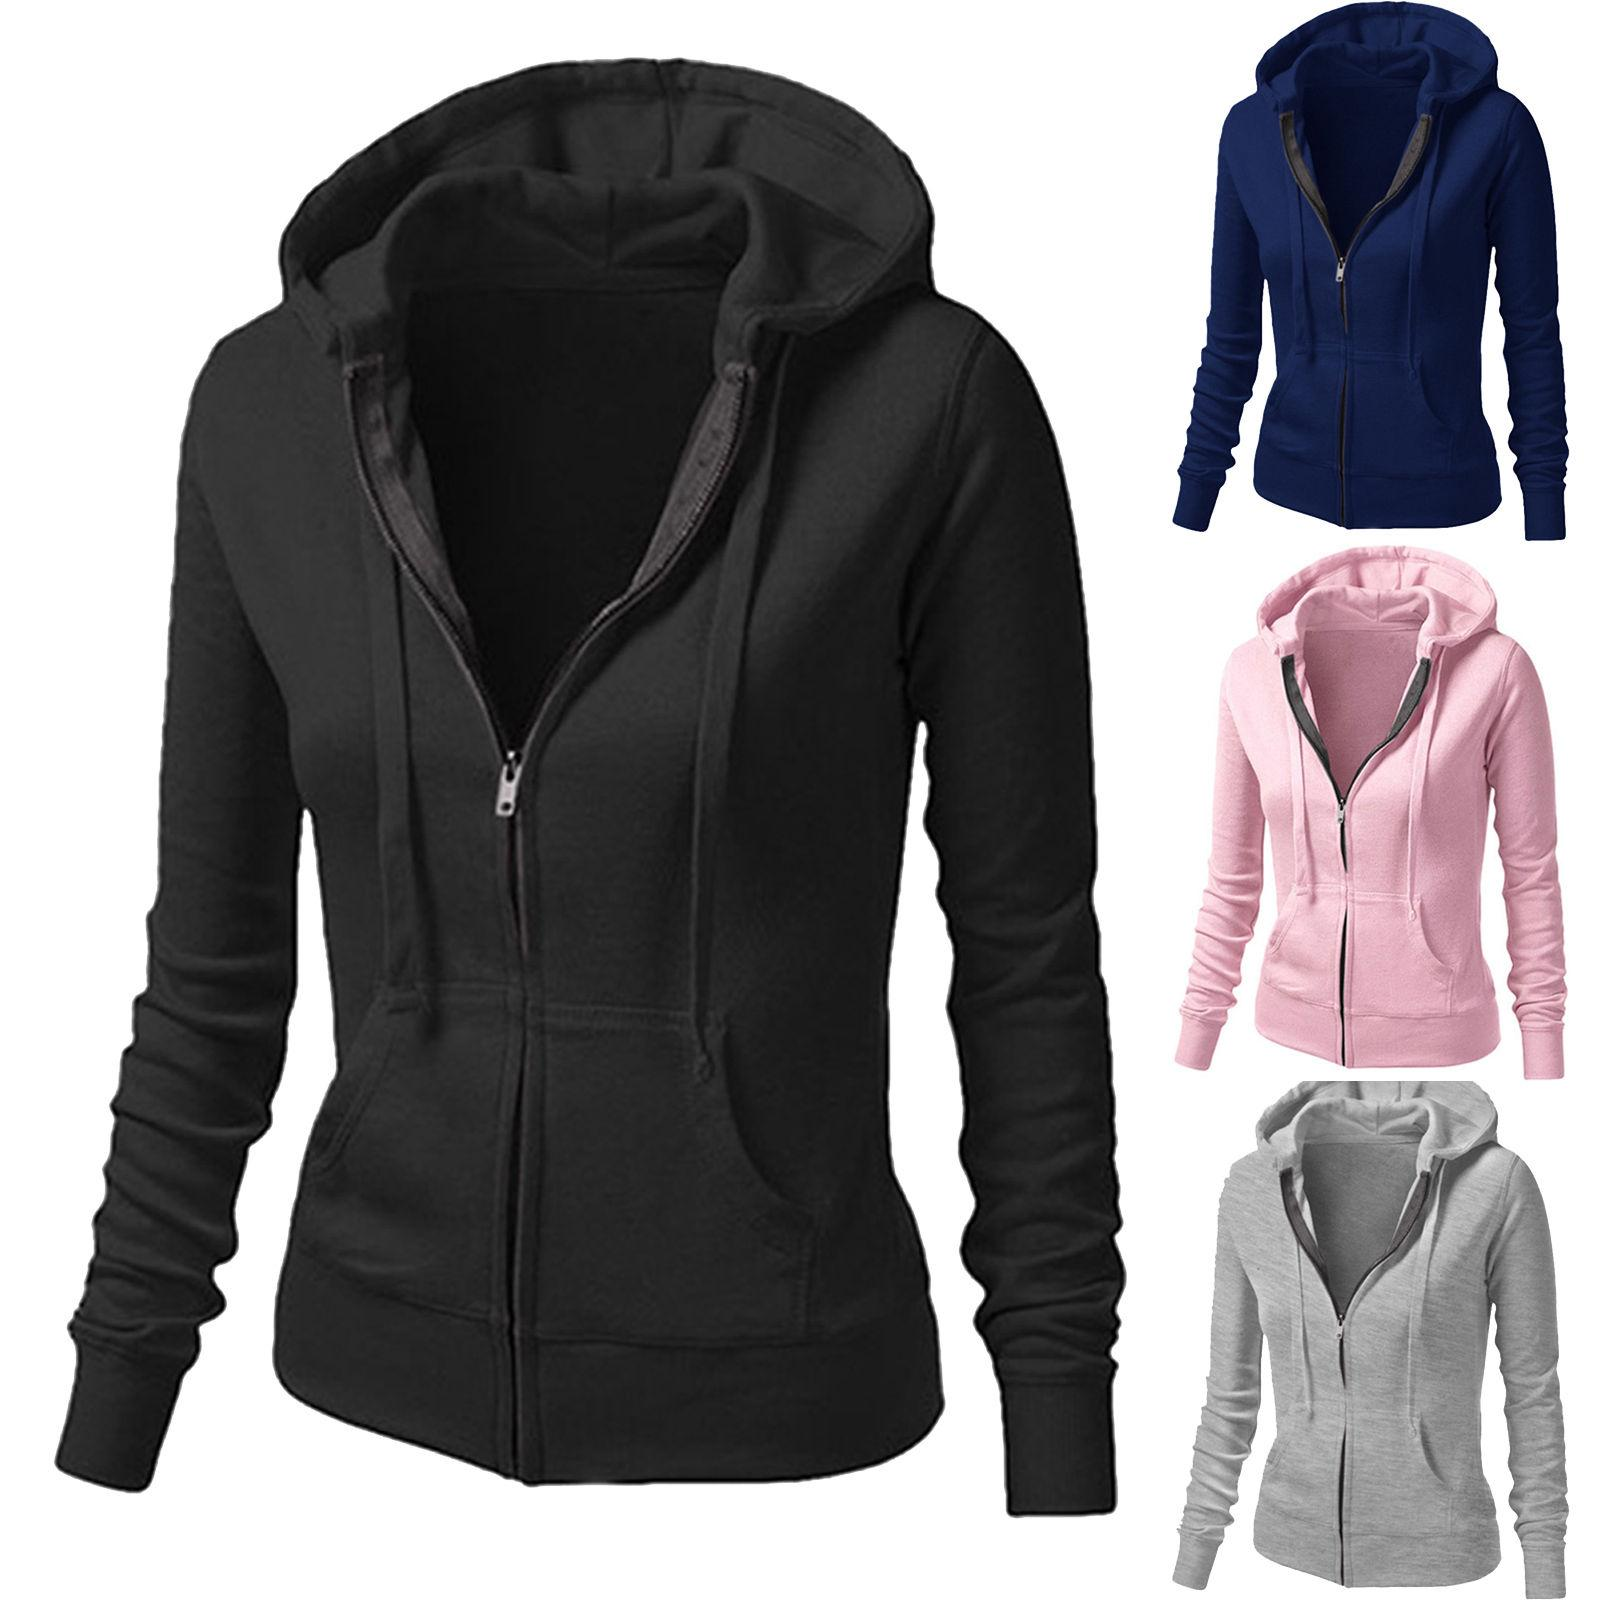 e82021d7d Womens Ladies Plain Girls Pocket Hoody Zip Up Tops Girls Drawstring Hoodies  Sportwear Sweatshirt Hooded Jackets Coat Outwear Ladies Leather Coats ...